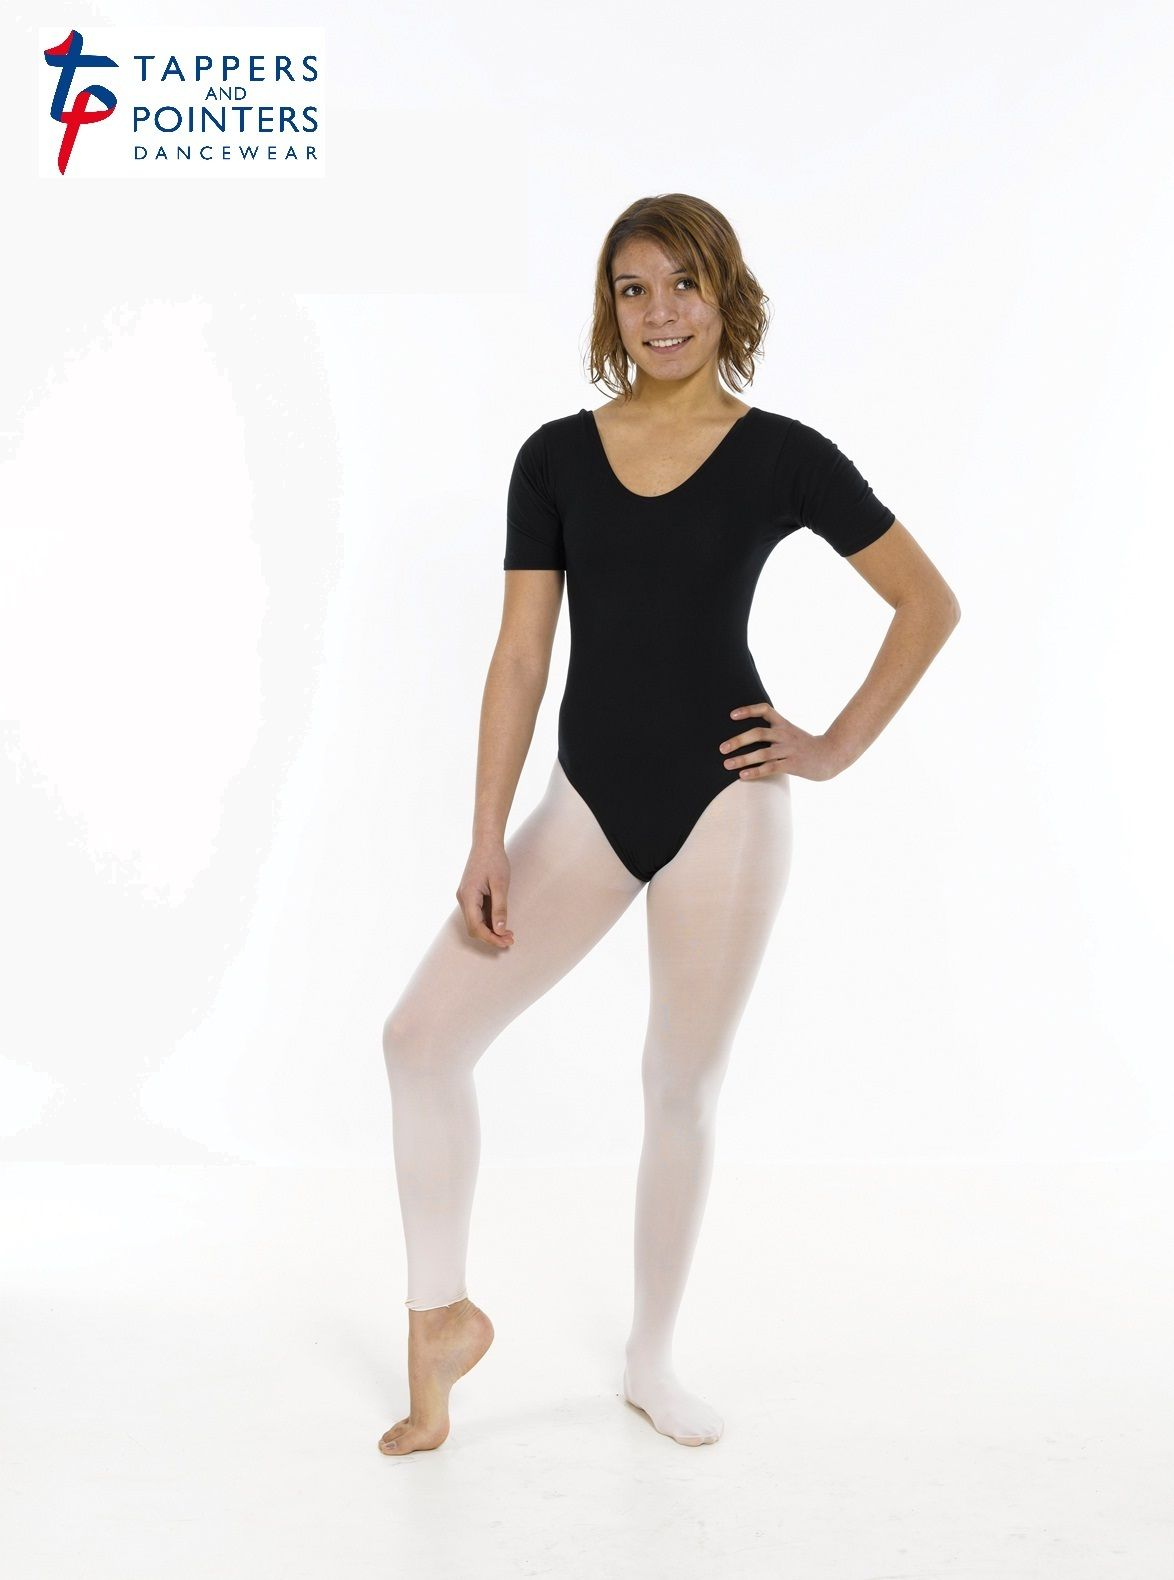 a16eb1dcbde5 New Short Sleeved Leotards For Gymnastics For Girls Ballet Menina Ballet  Clothes Children. Yesterday's price: US $8.06 (7.14 EUR)…